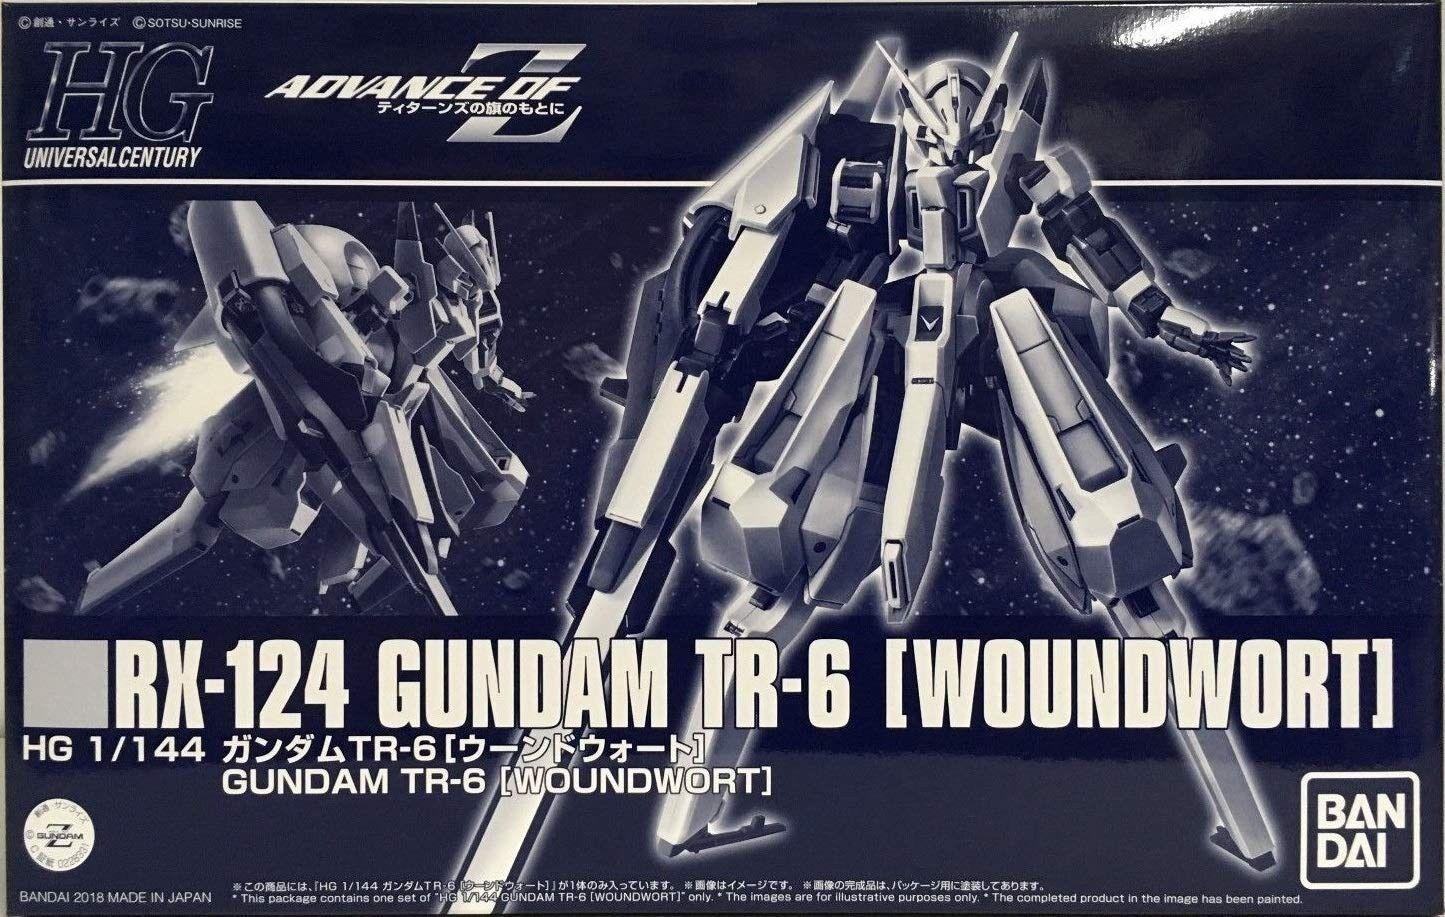 Bandai Hguc 1 144 Rx-124 Gundam Tr-6 Woundwort Kit de Modelismo A. O. Z Nuevo